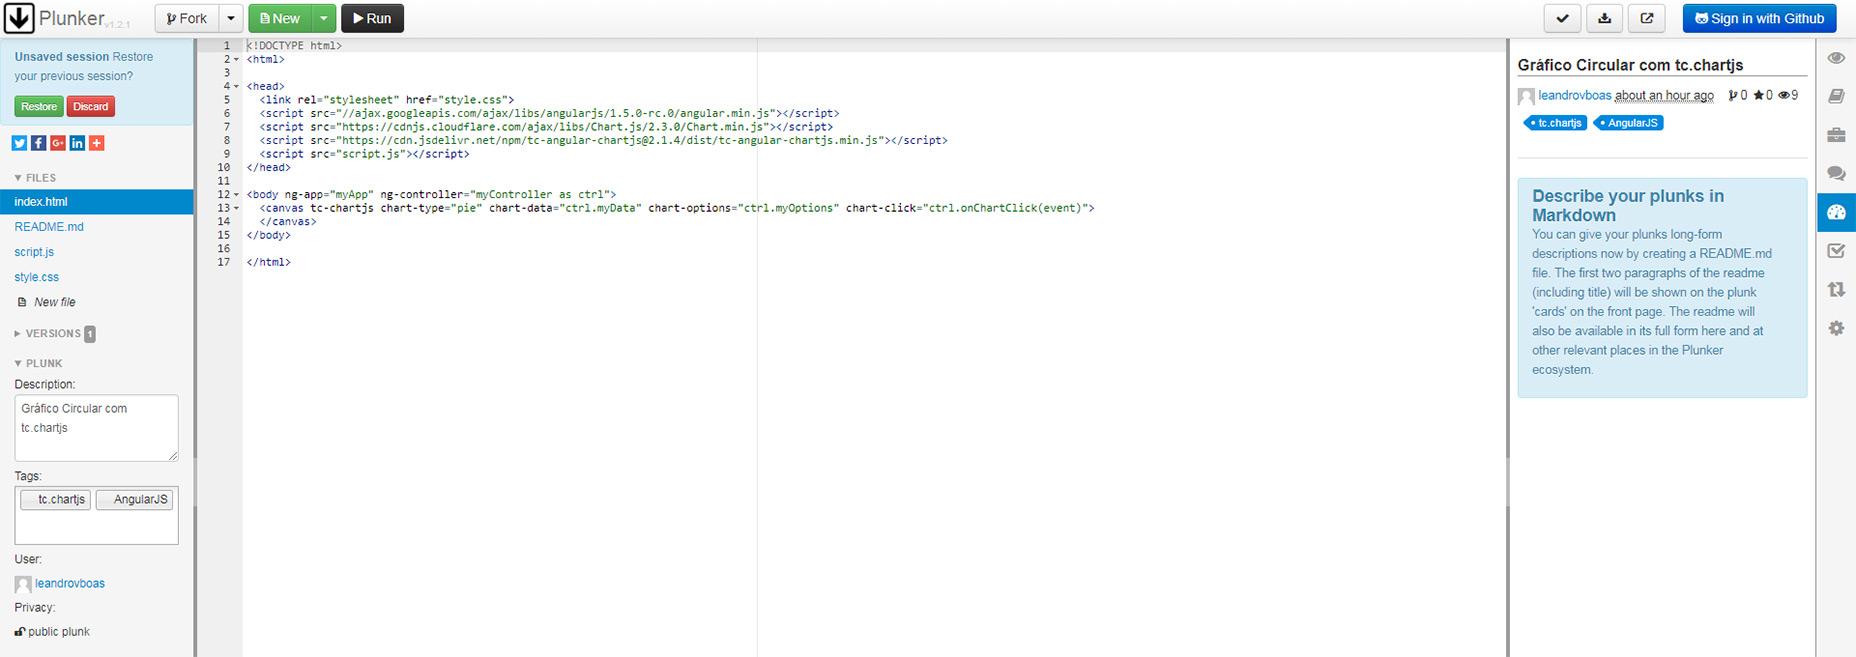 05-plunker-coding-ide-webapp